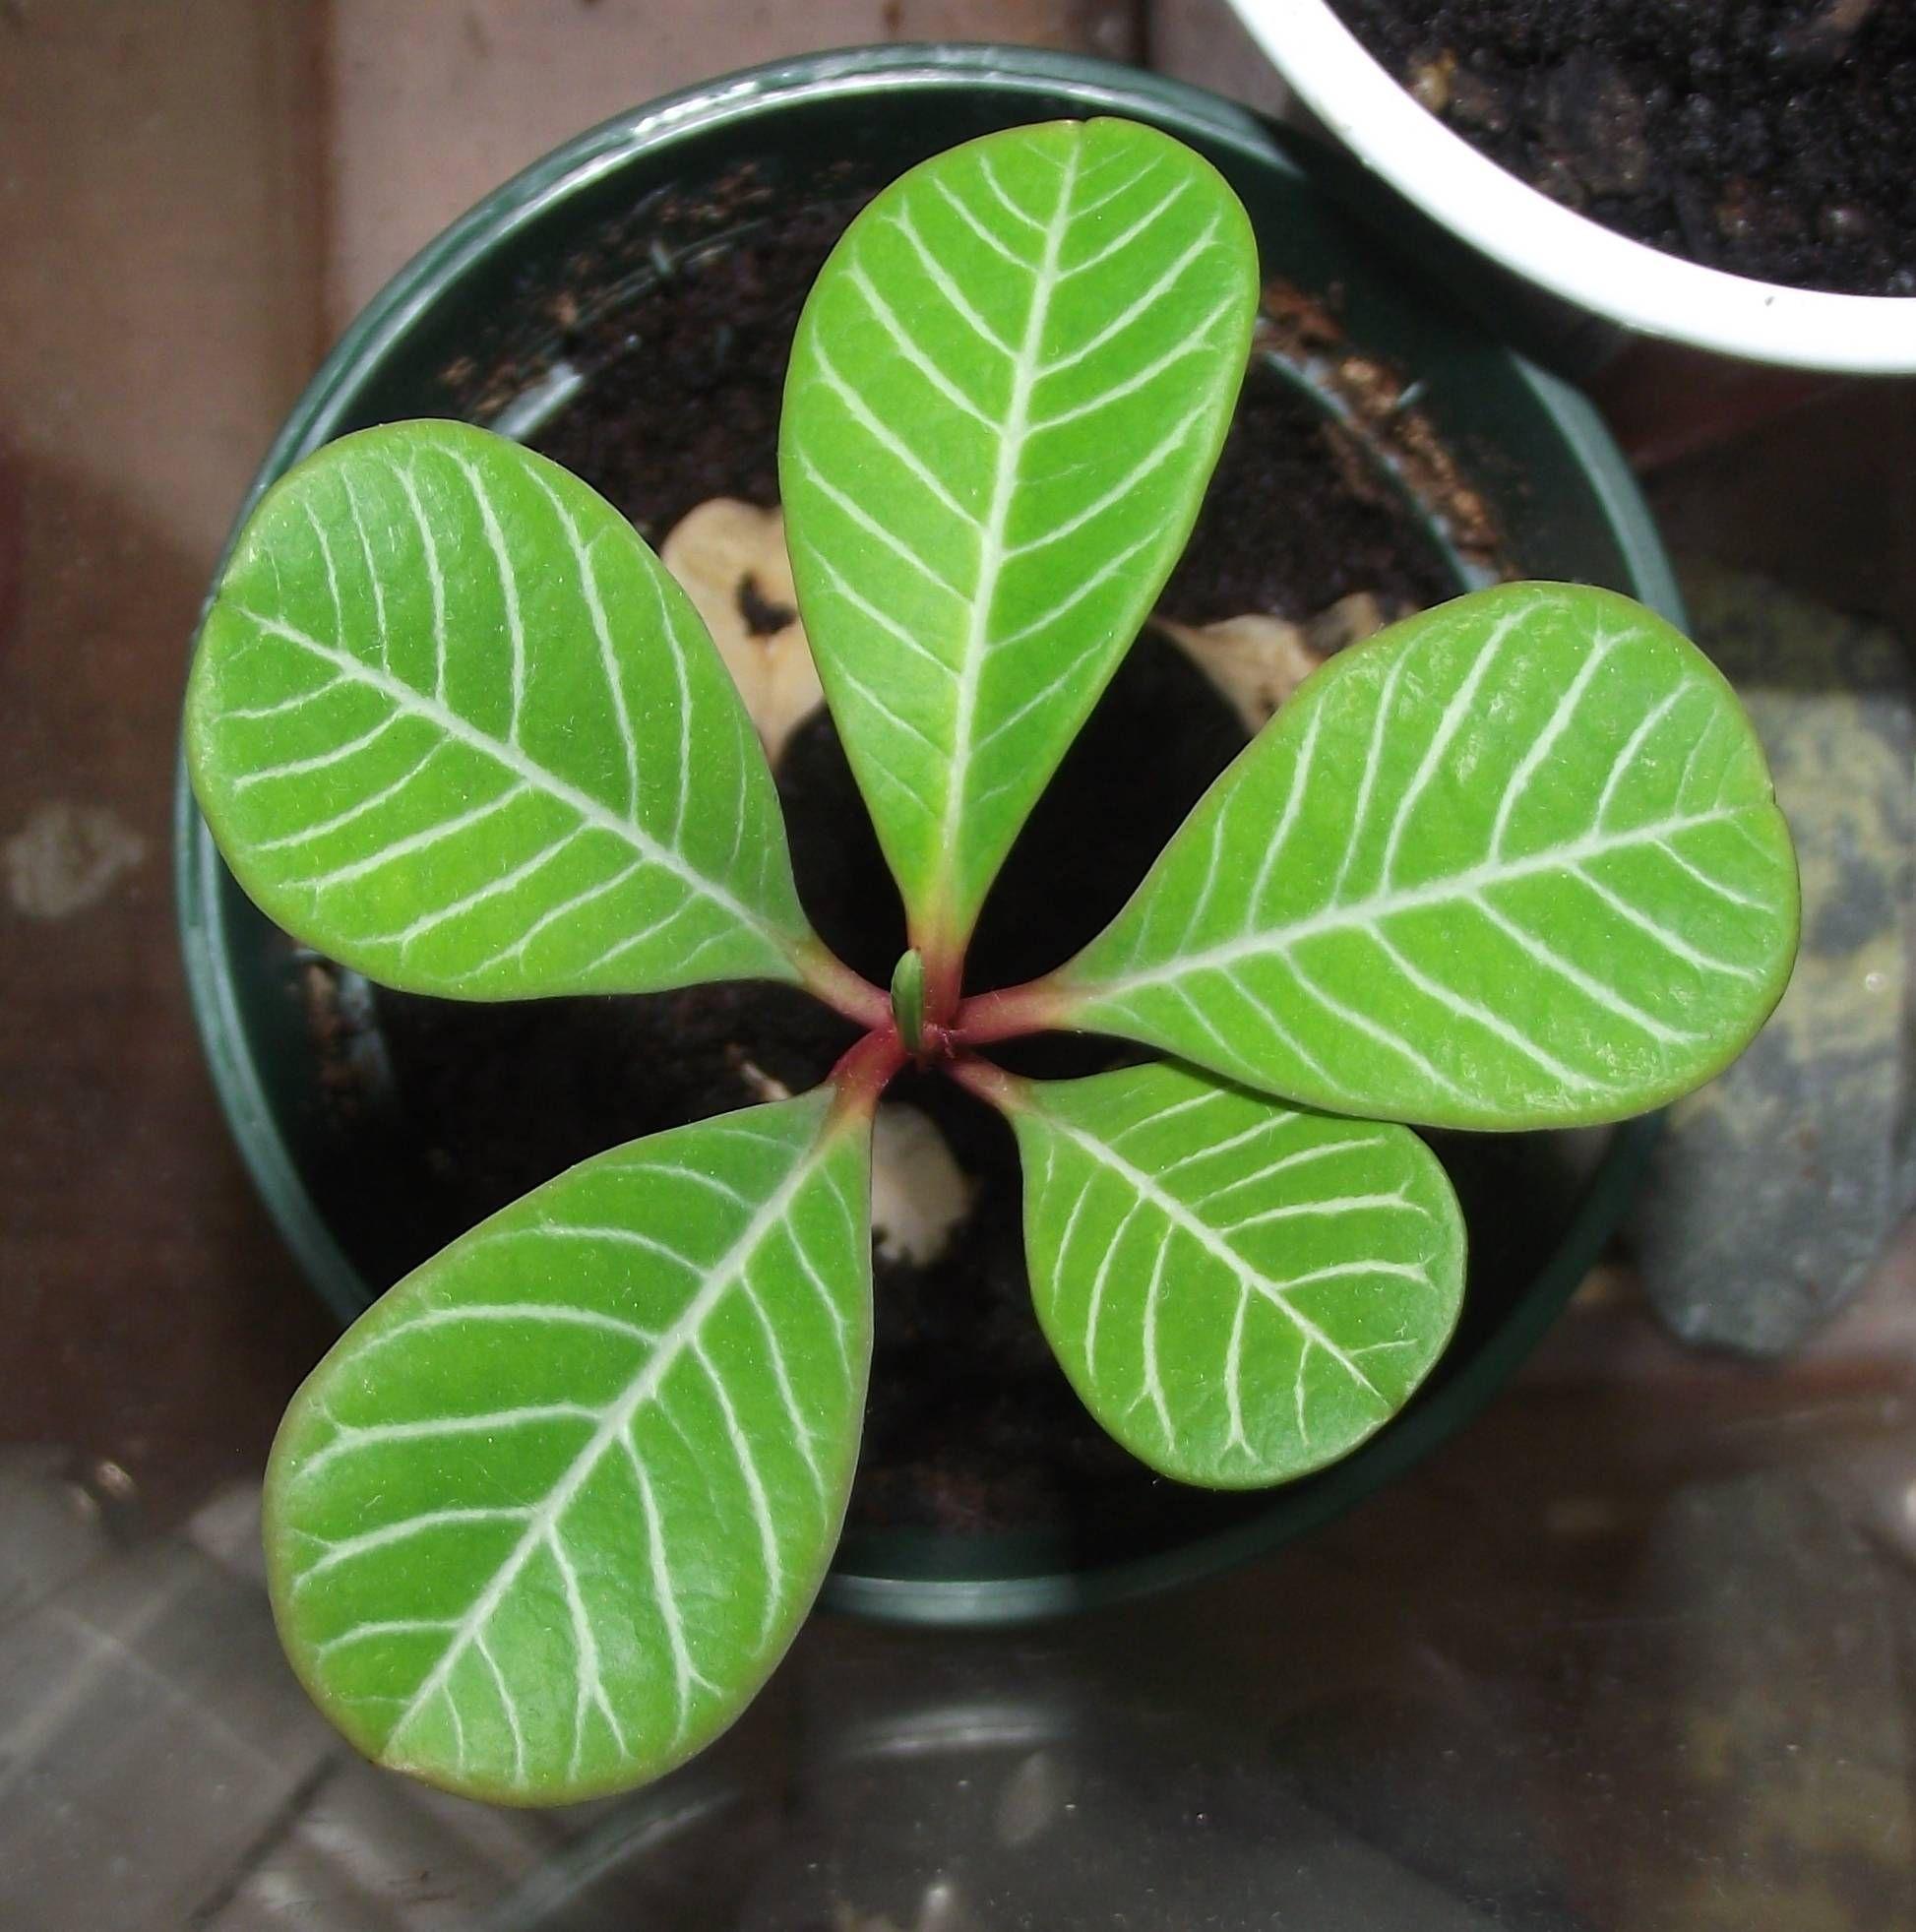 Madagascar Jewel (Euphorbia leuconeura) on an office